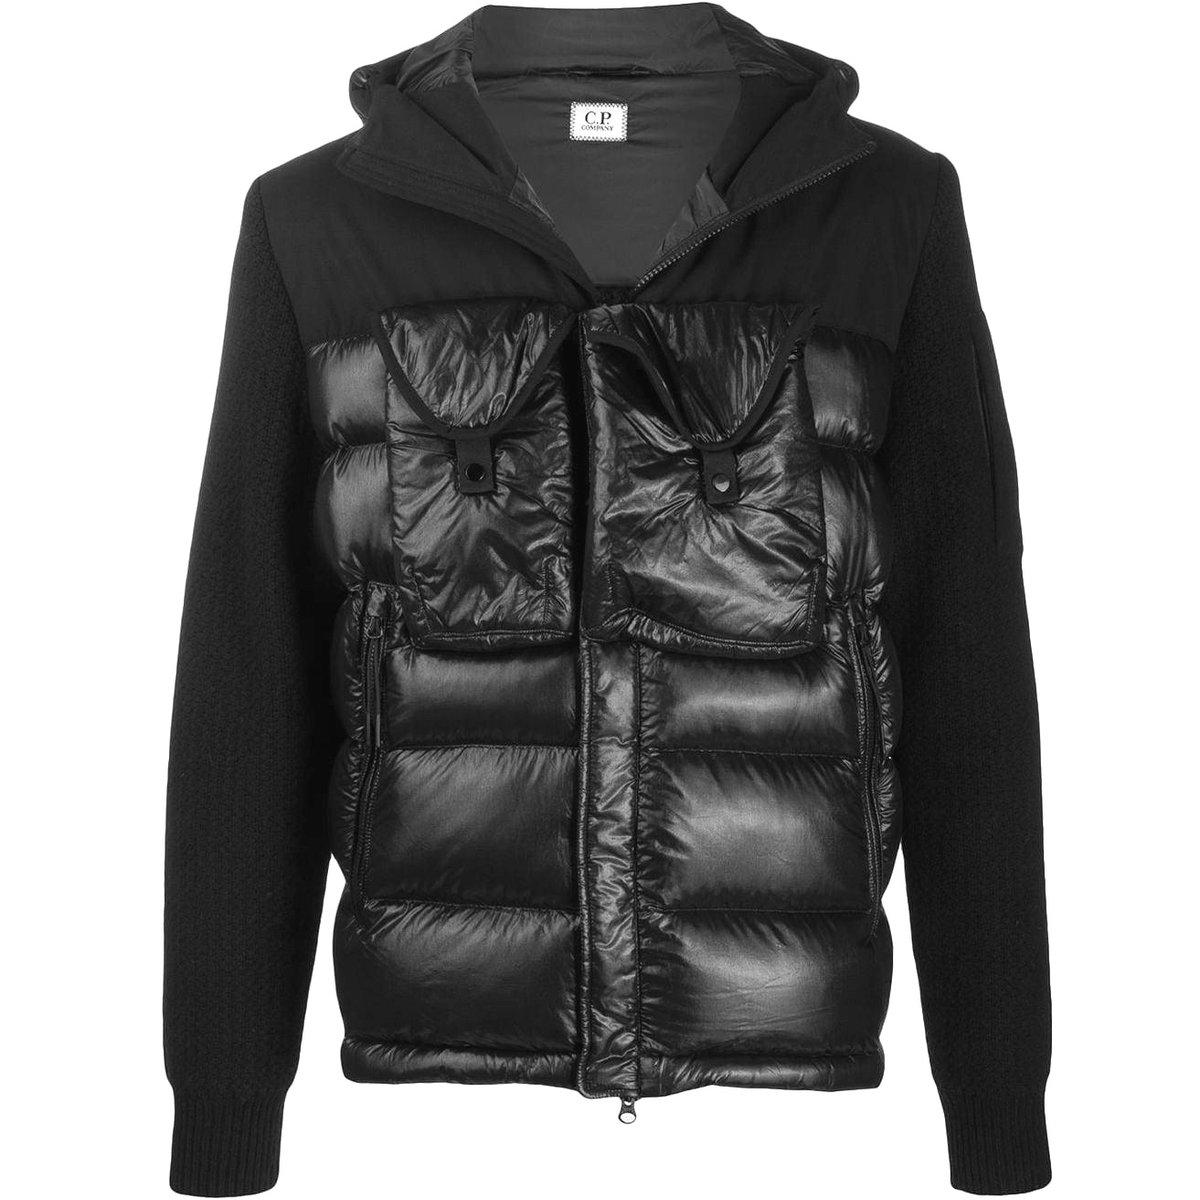 c-p-company-Black-Zipped-Padded-Jacket (2).jpg